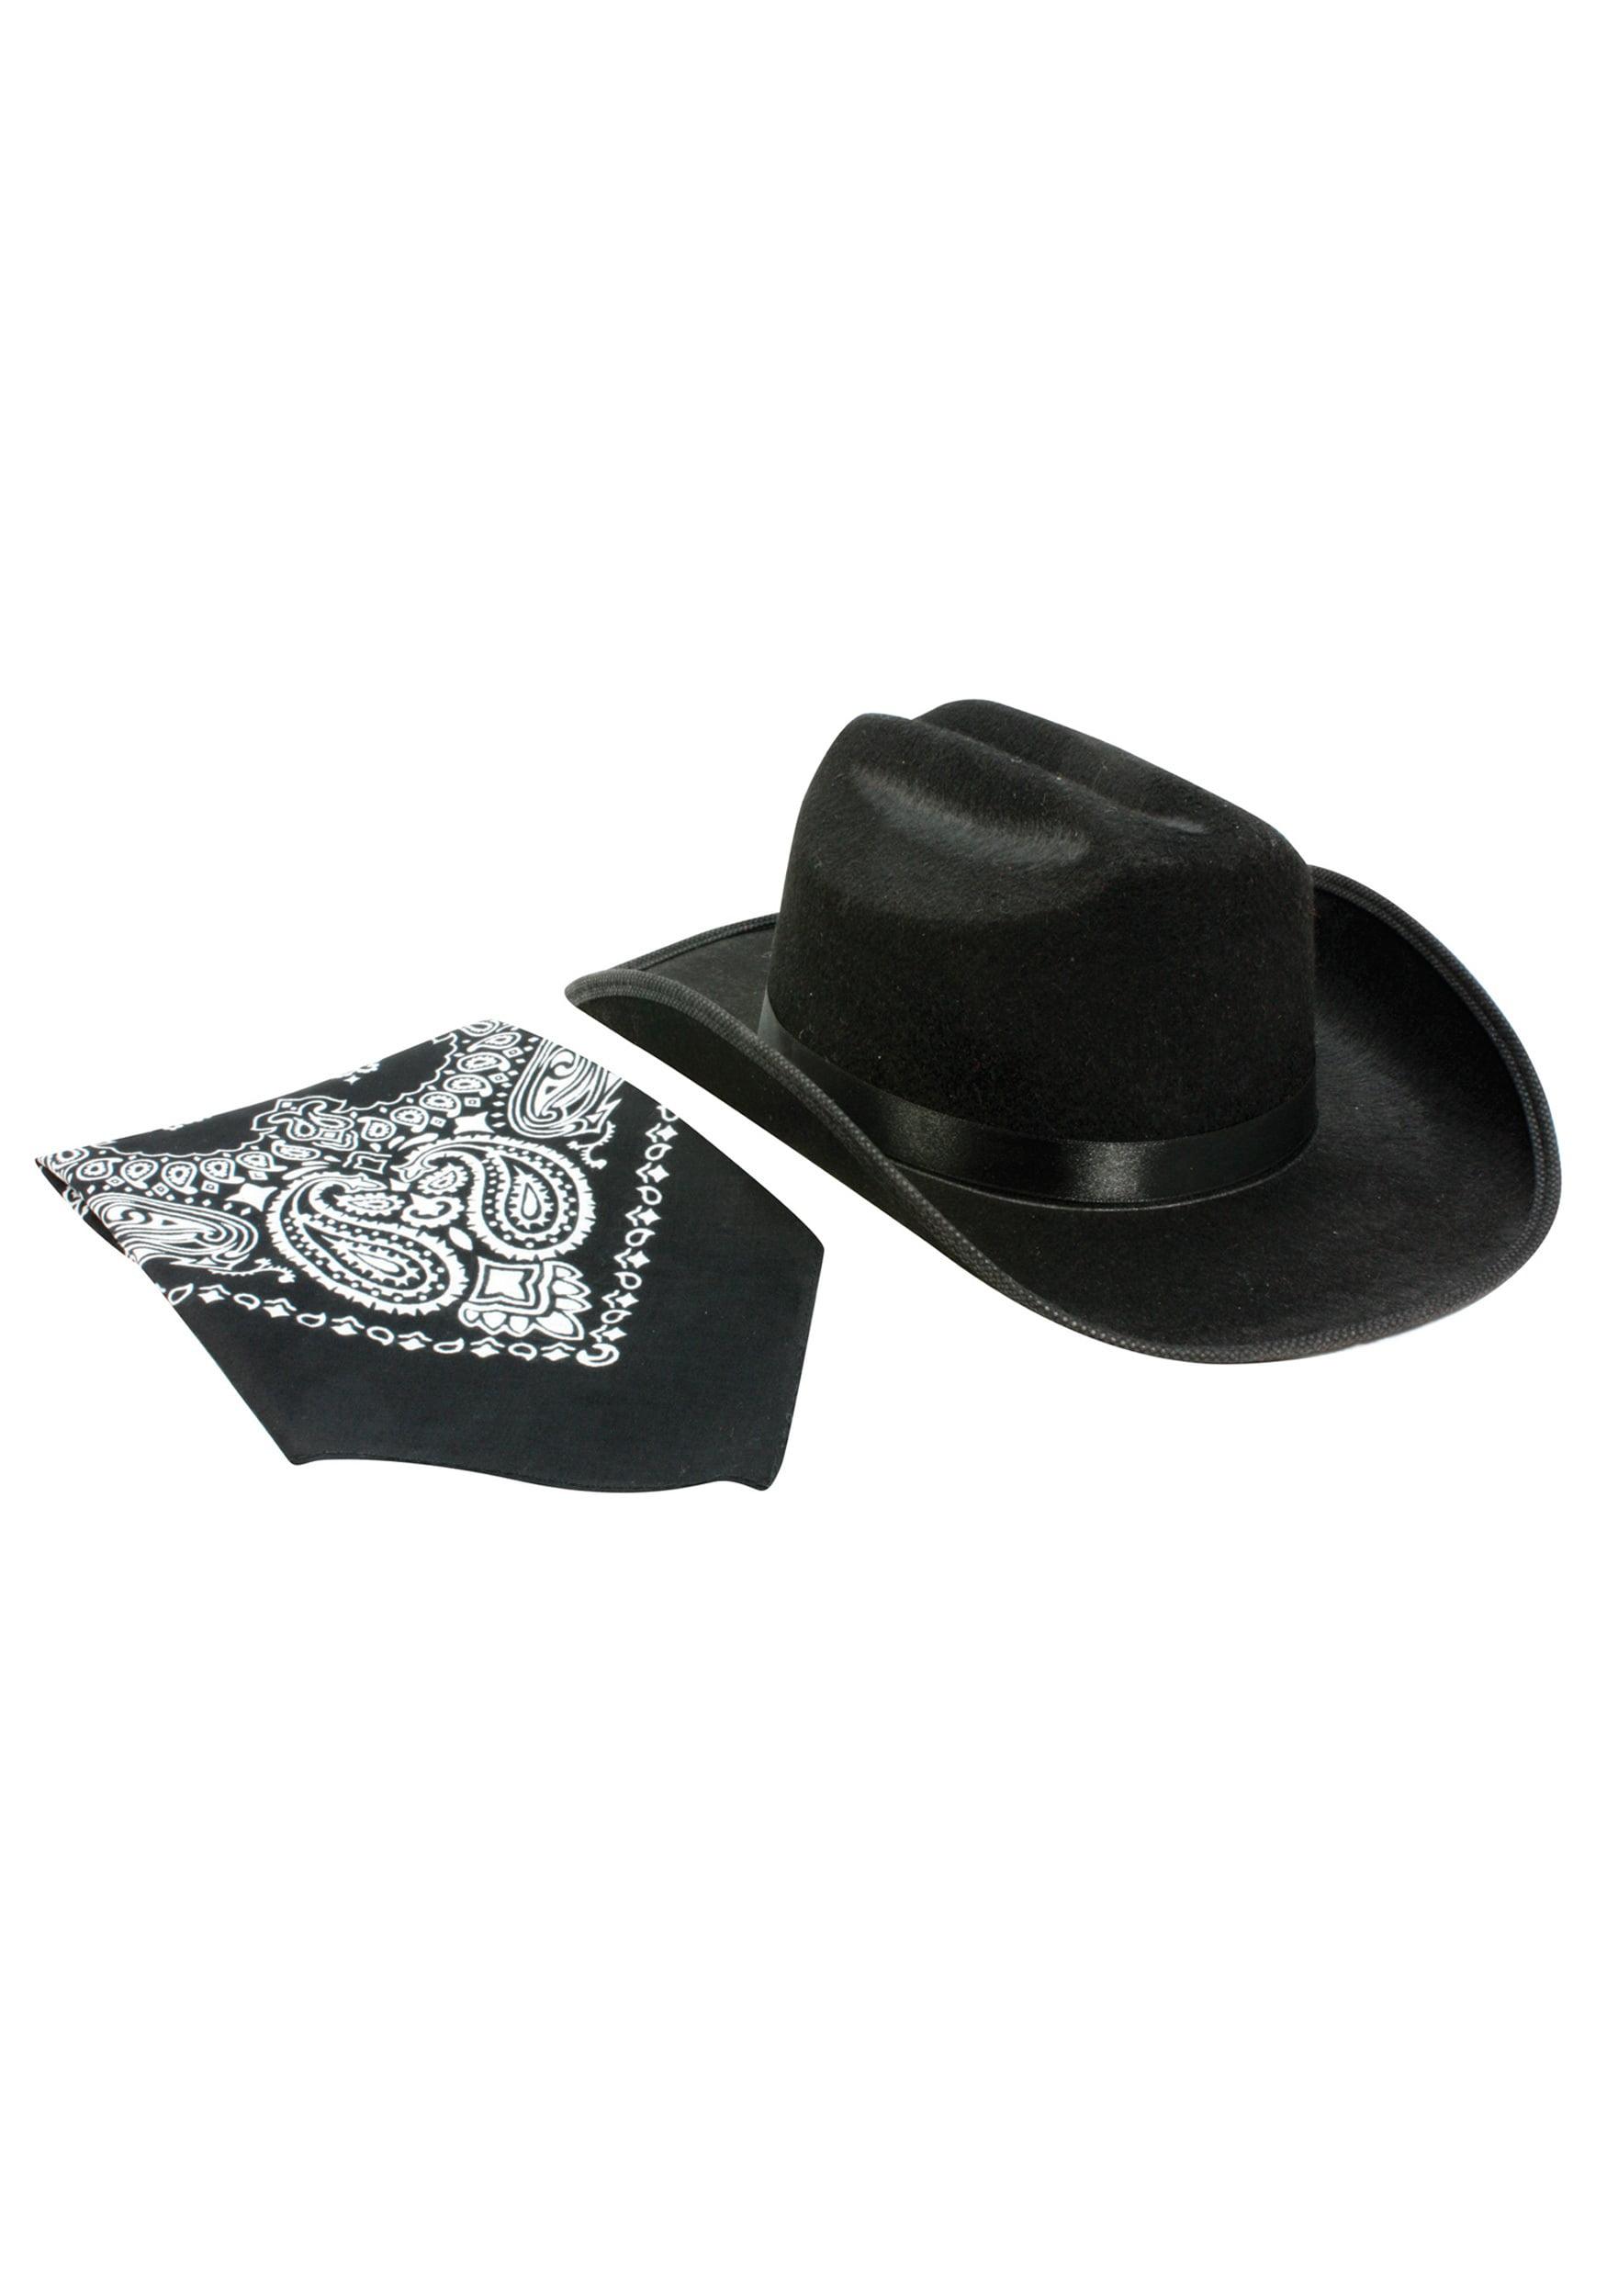 7afa9656197 Kids Black Cowboy Hat and Bandana Set - Walmart.com